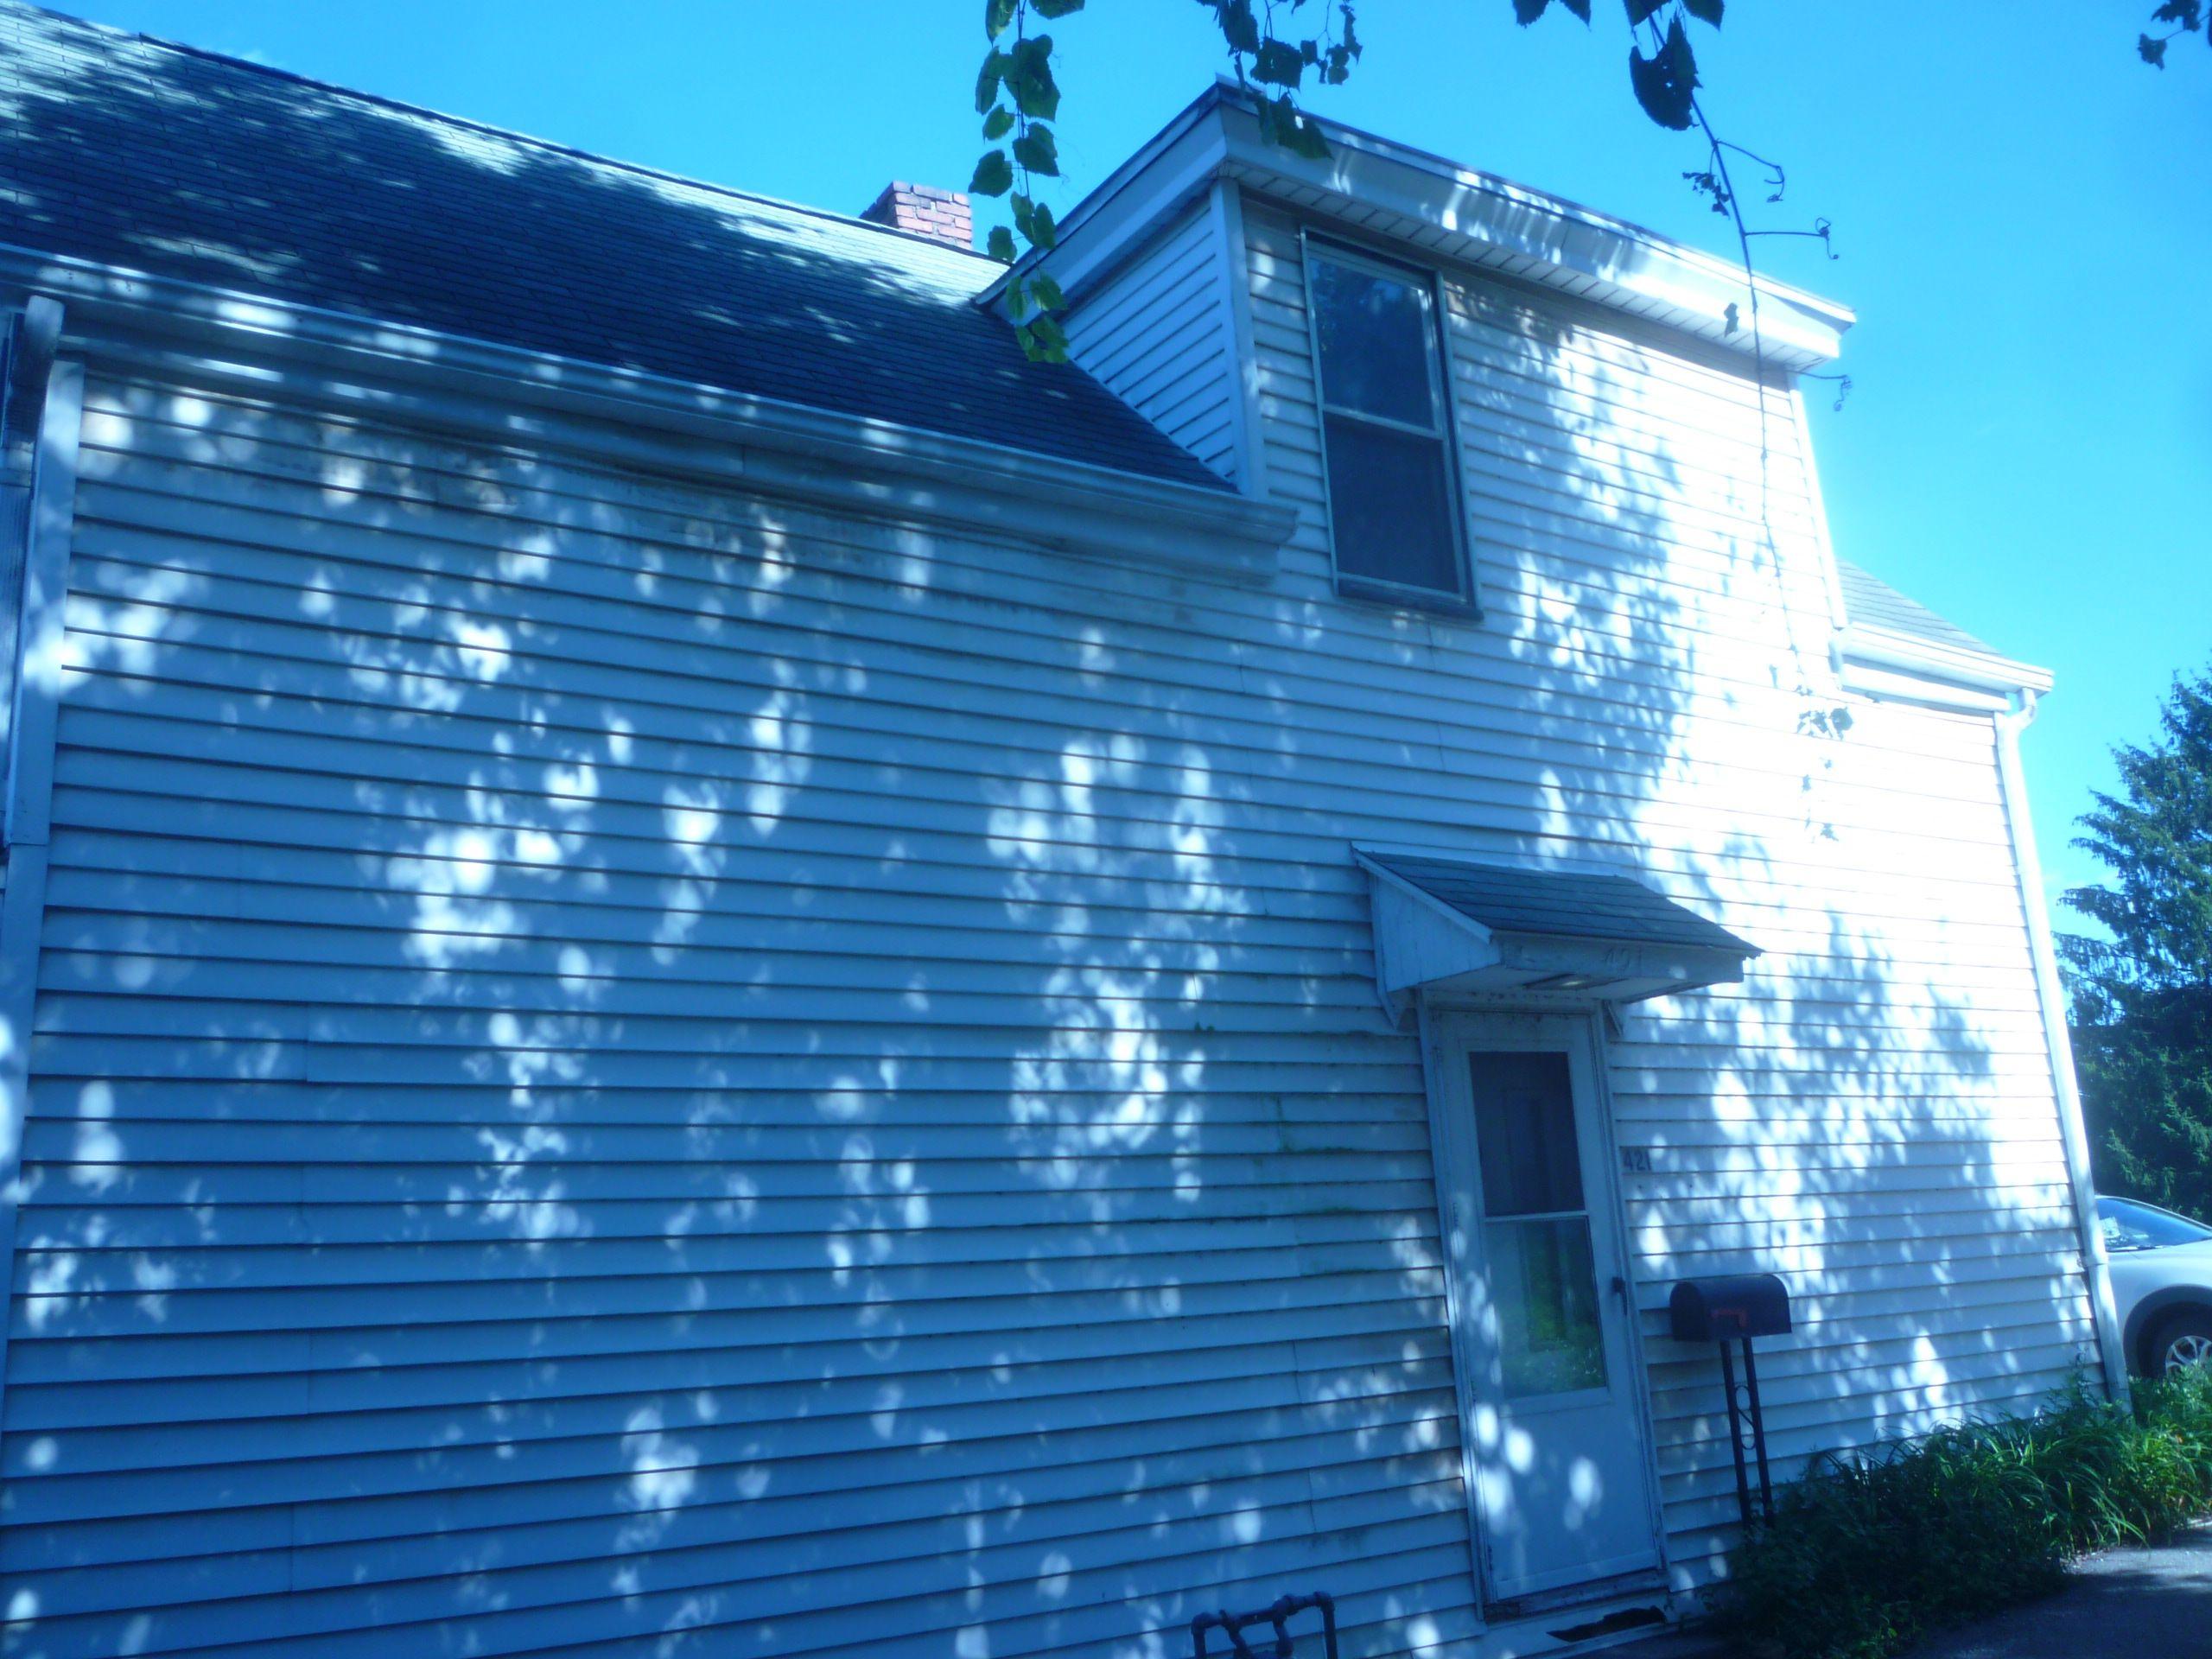 421 Markle St, North Versailles, PA